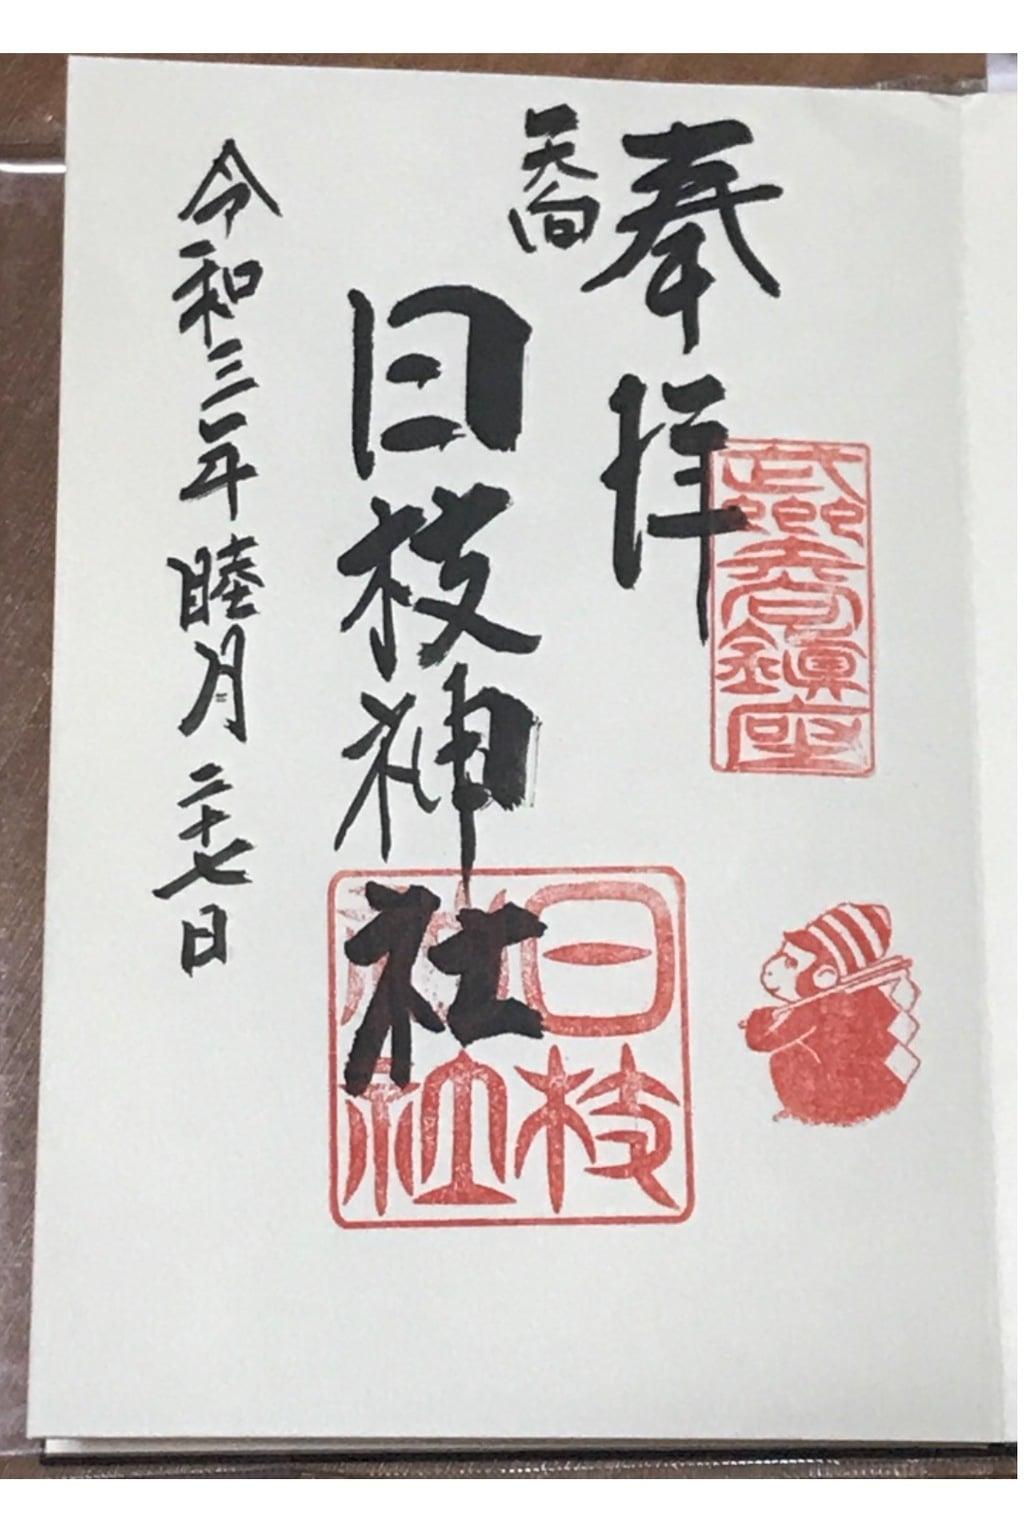 矢向日枝神社の御朱印